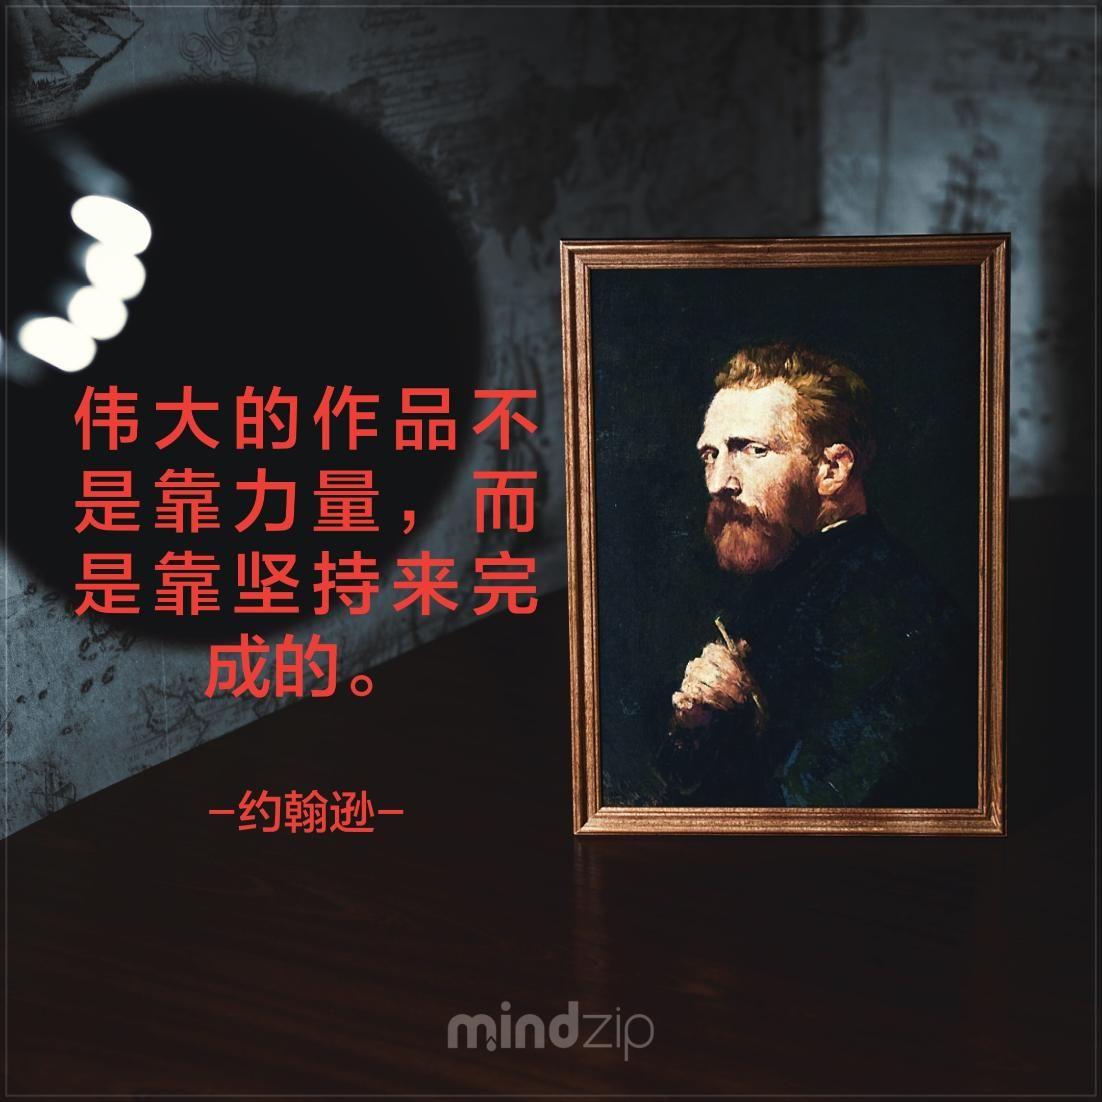 Pin by MindZip簡體中文 on MindZip 在學習和技巧掌握上提高兩倍的速度 | Movie posters, Movies